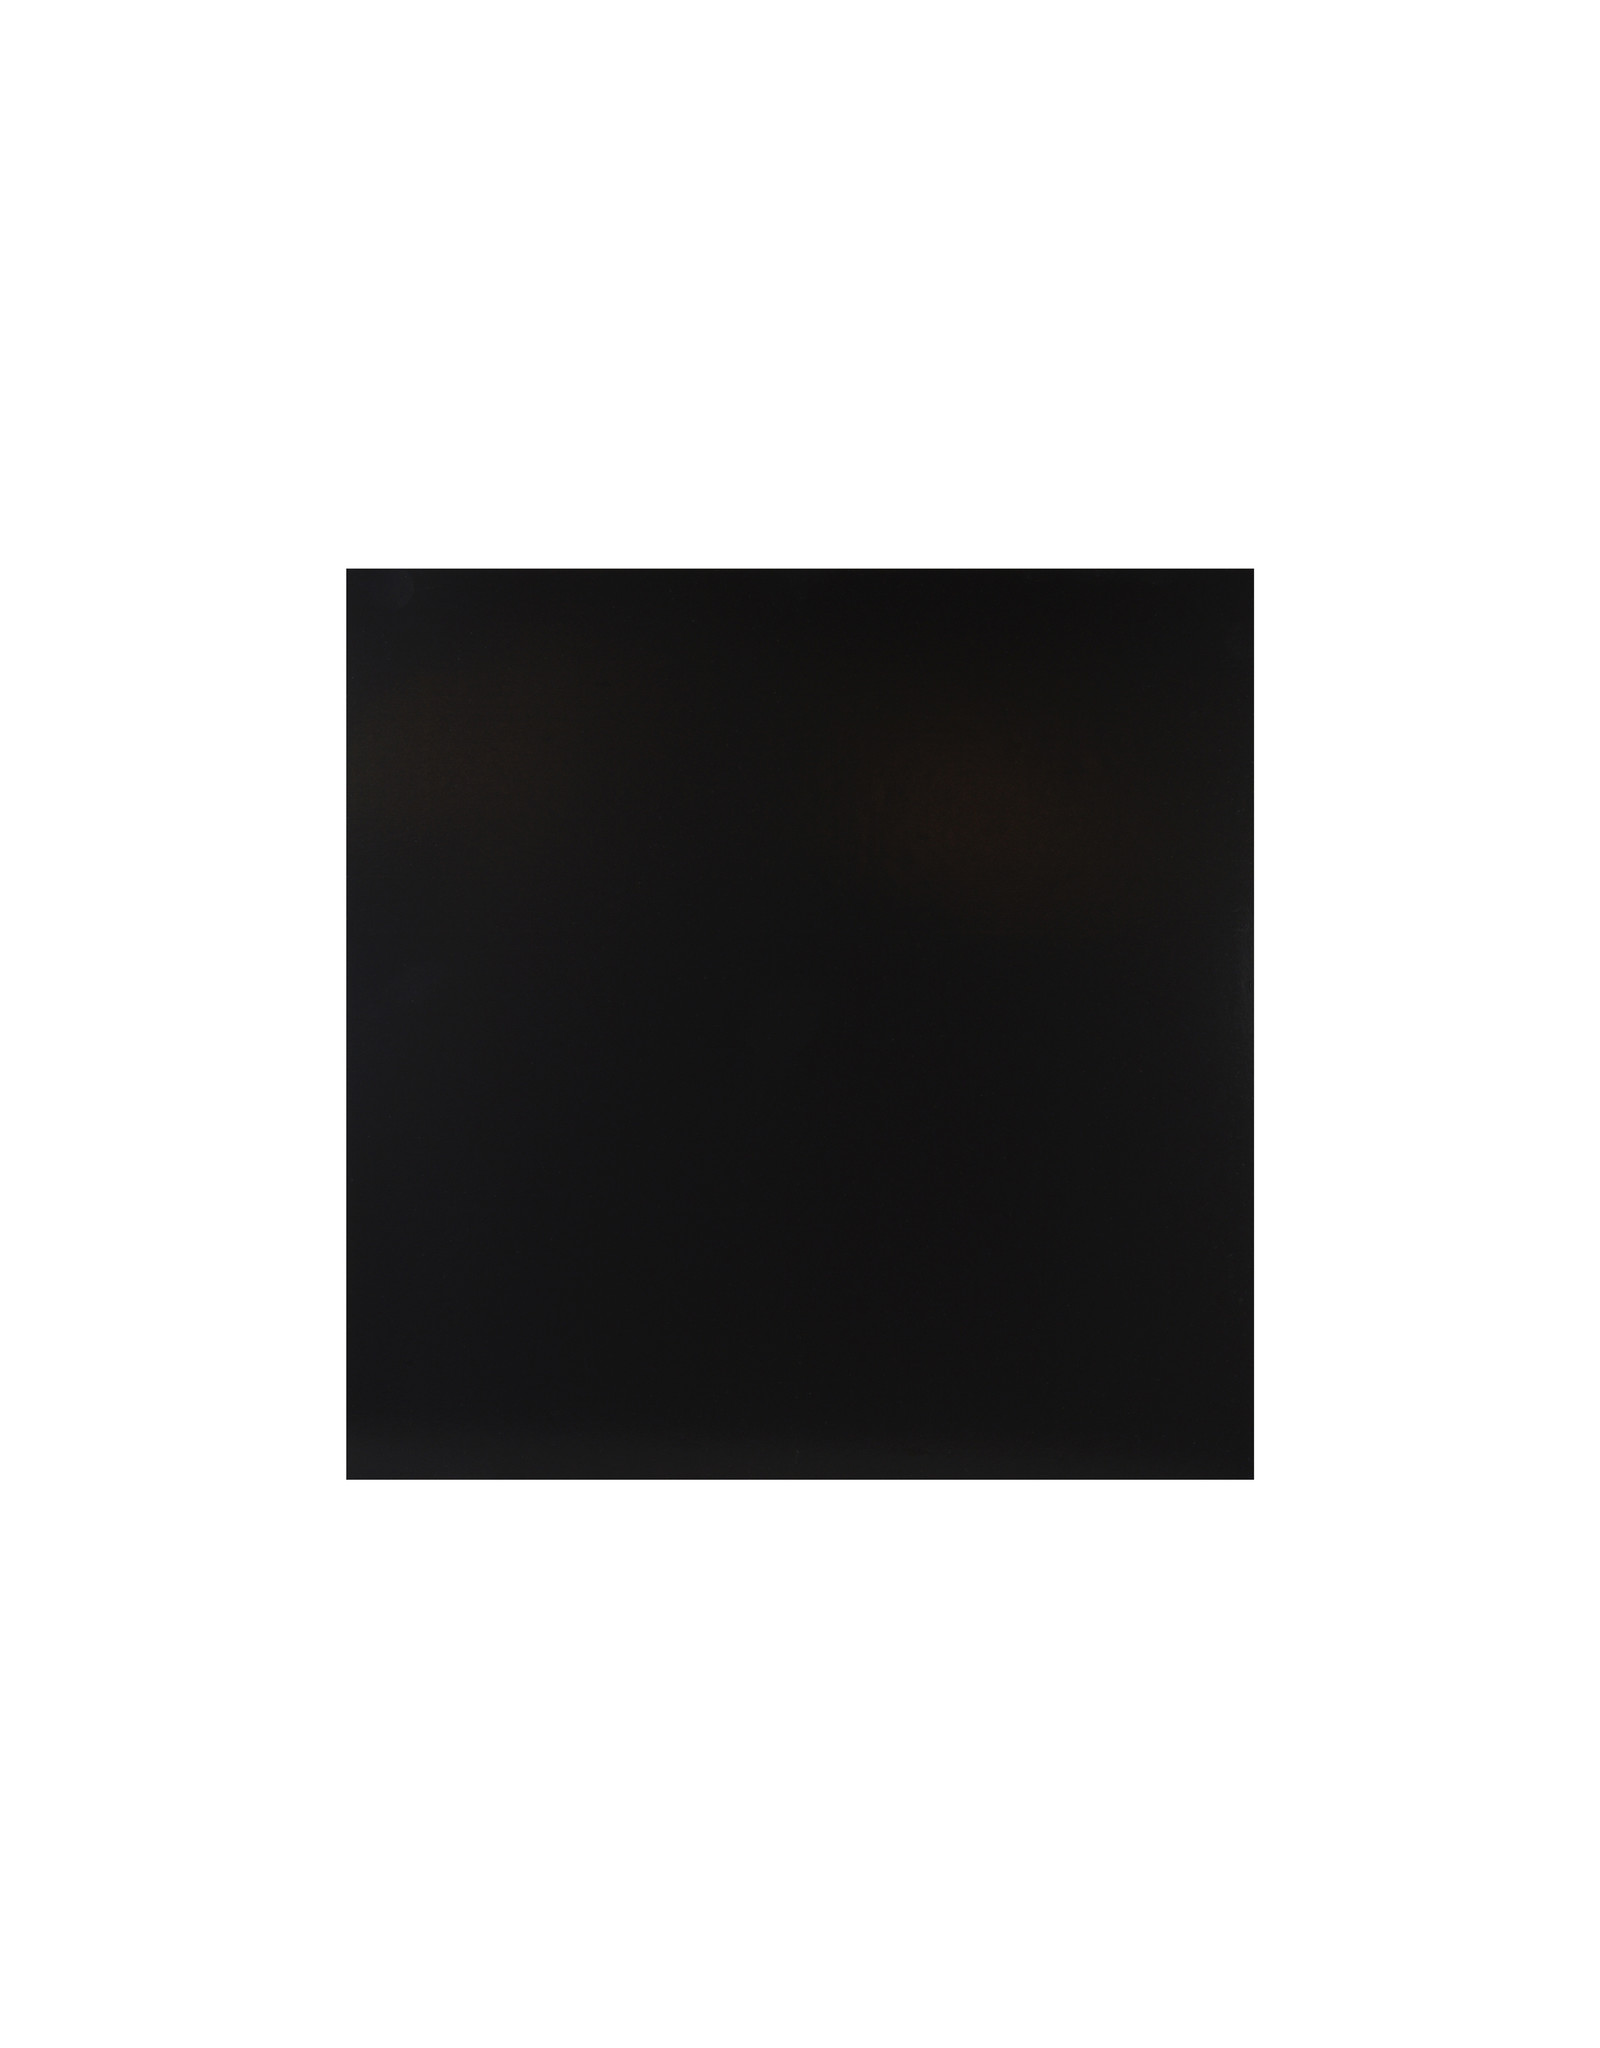 Prima PrimaCreator FlexPlate-Powder Coated PEI verschillende maten